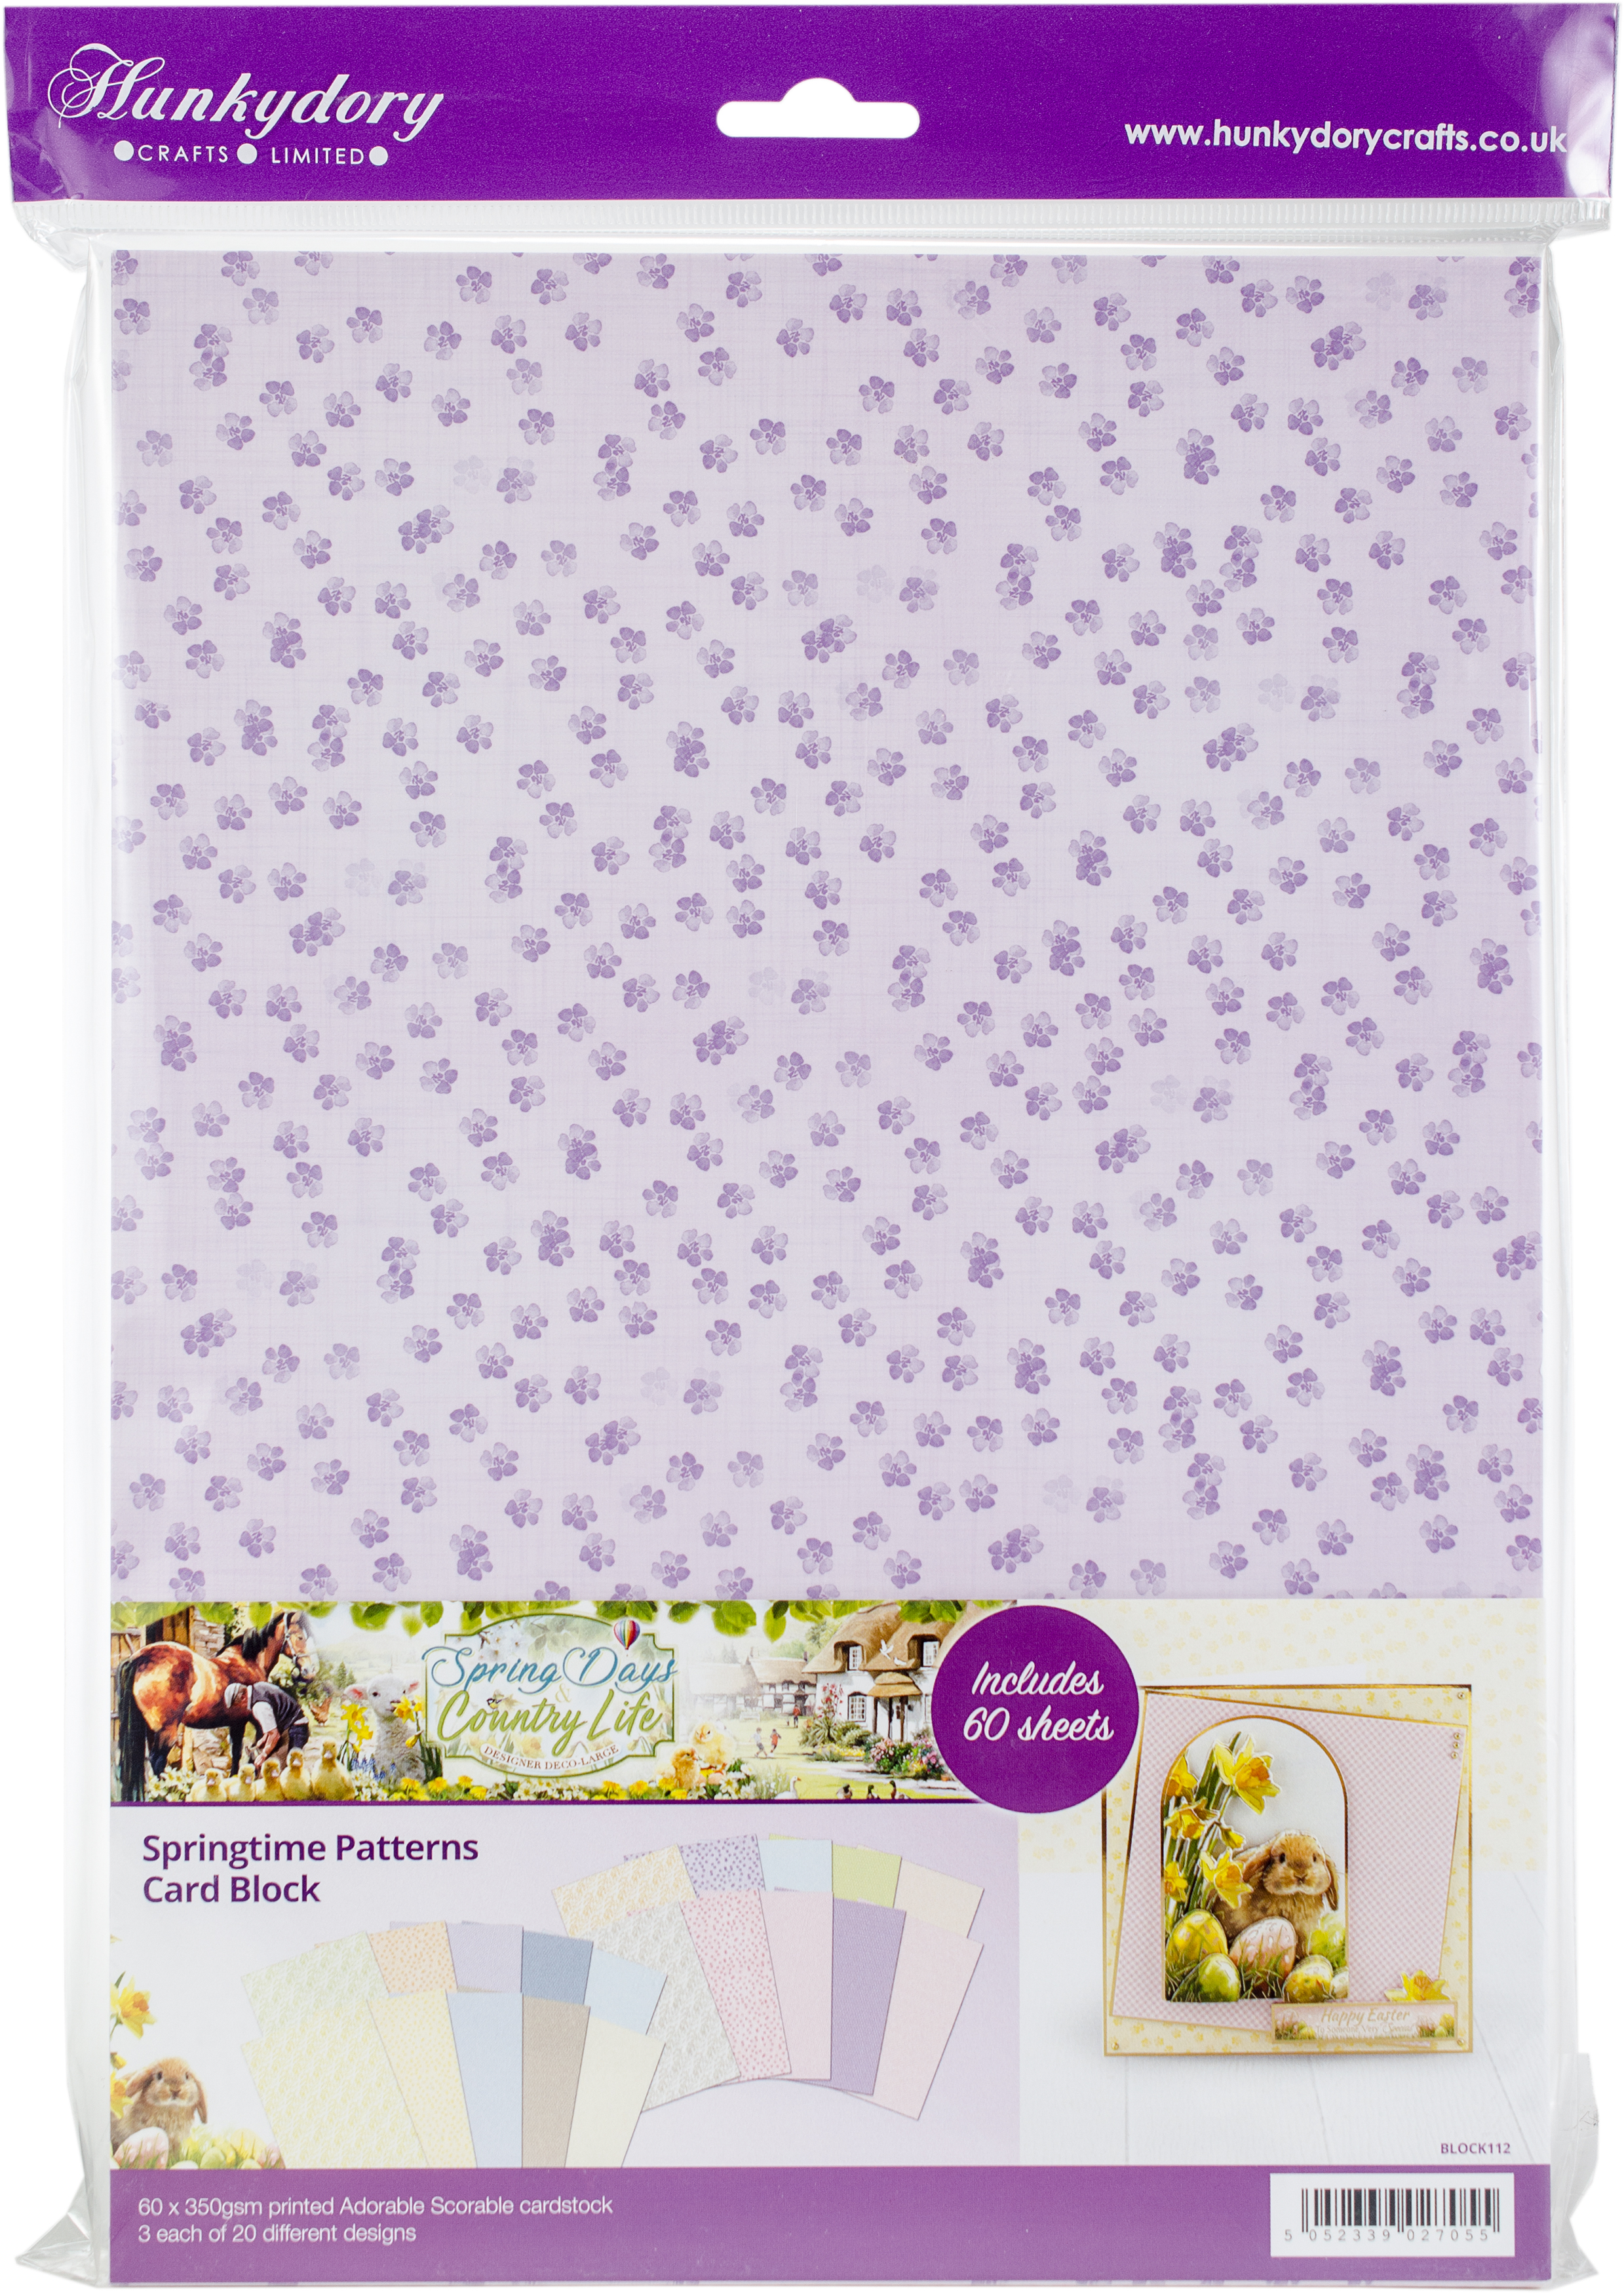 Springtime Patterns Card Block